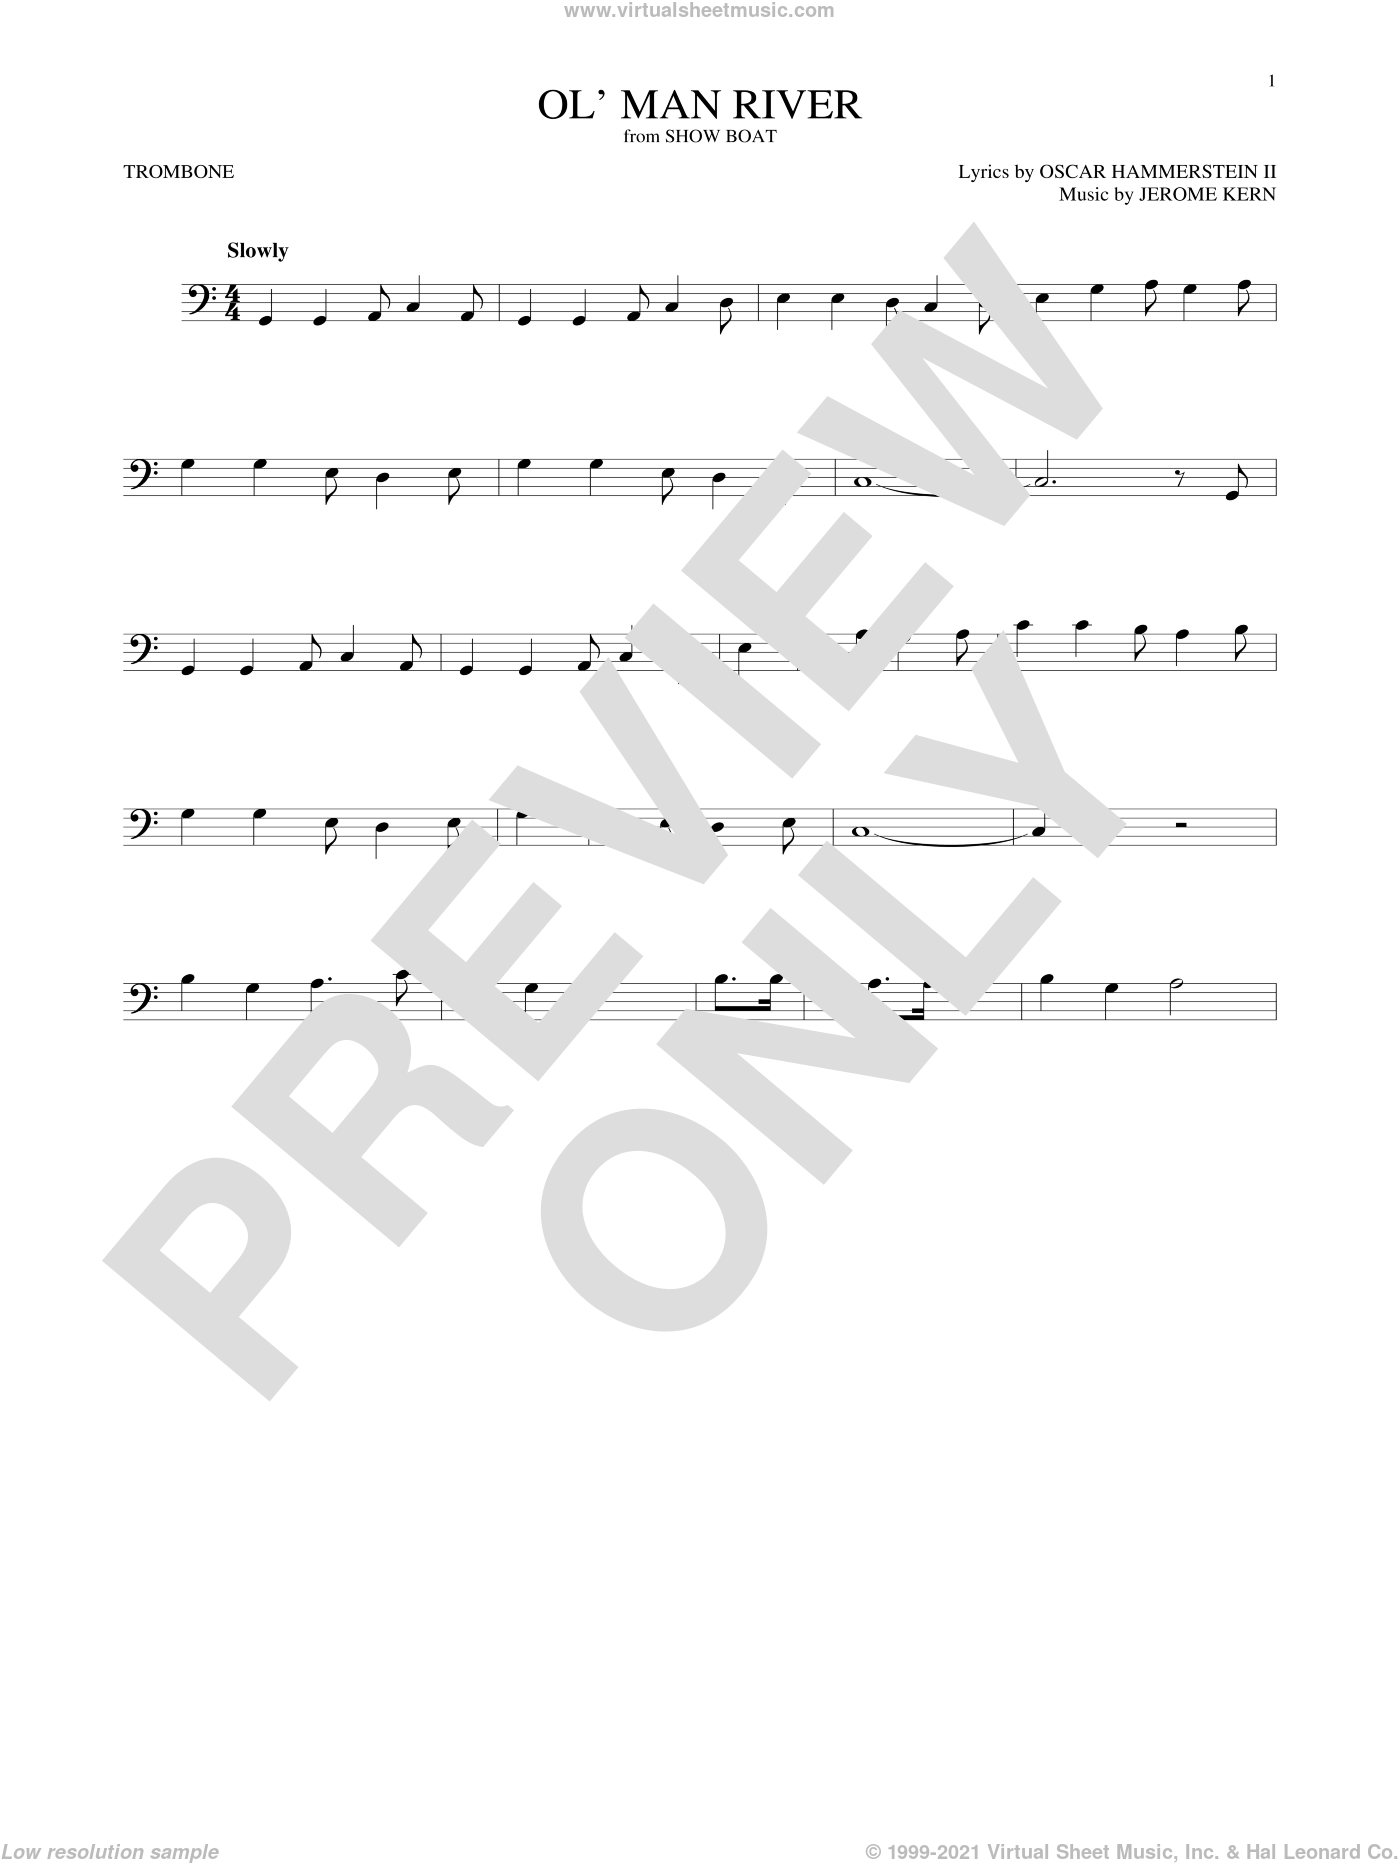 Ol' Man River sheet music for trombone solo by Oscar II Hammerstein and Jerome Kern, intermediate skill level